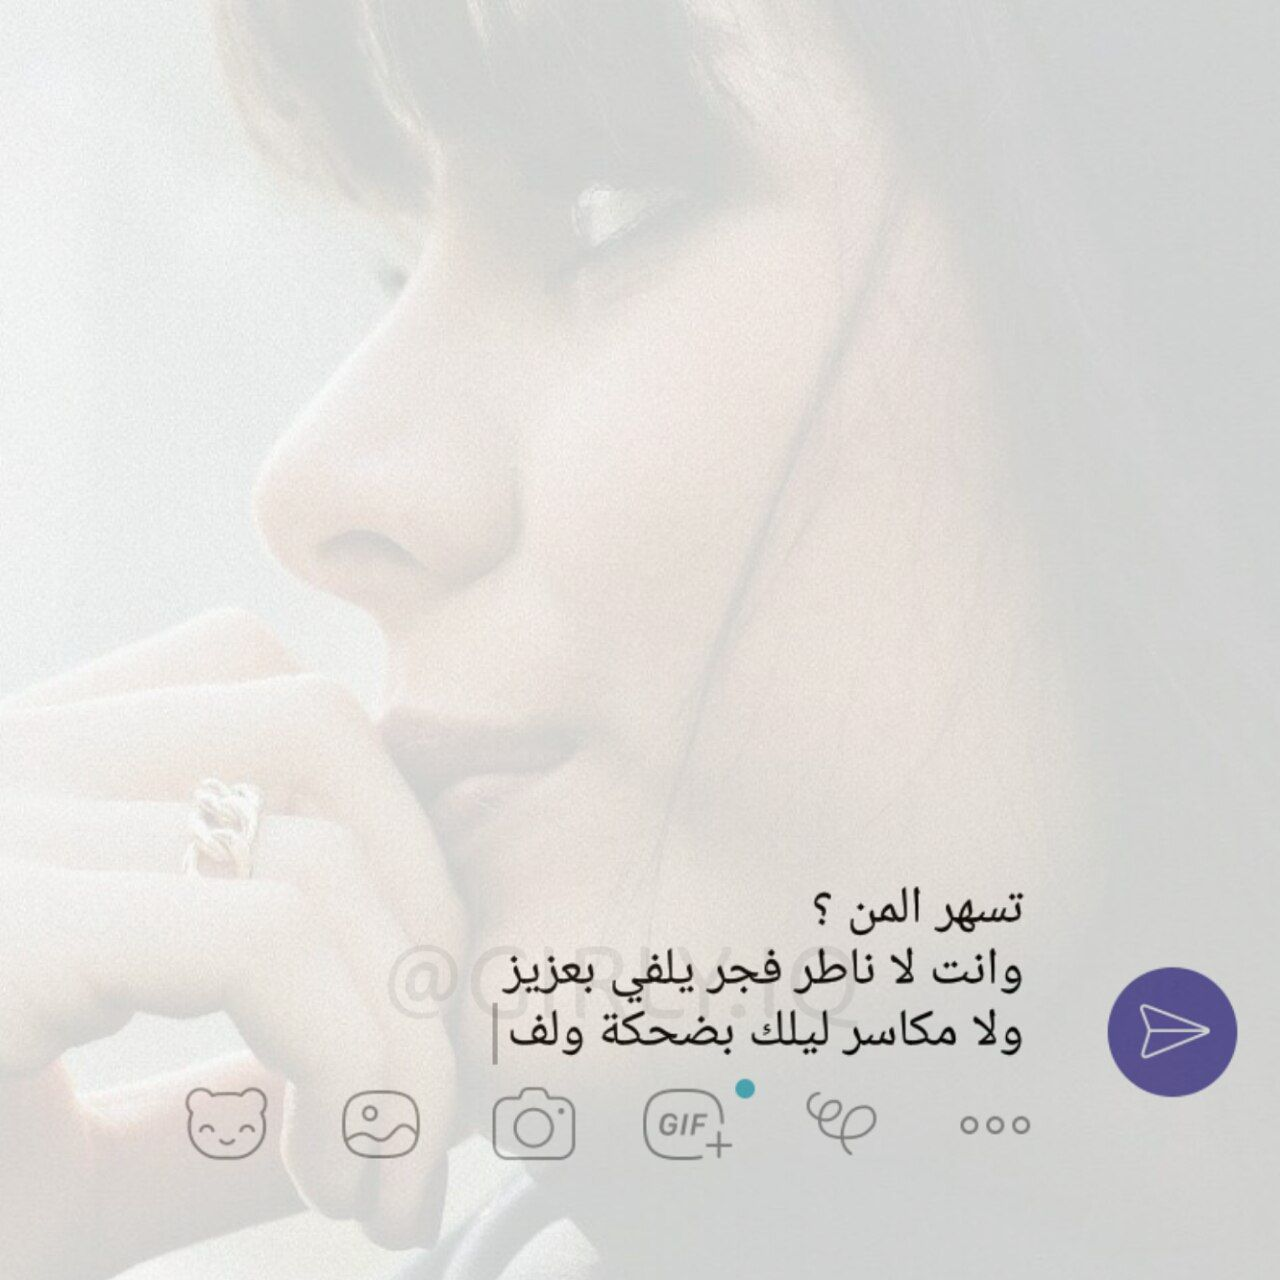 خايب بالي يمك والسهر رايدله بال Arabic Quotes Qoutes Quotes